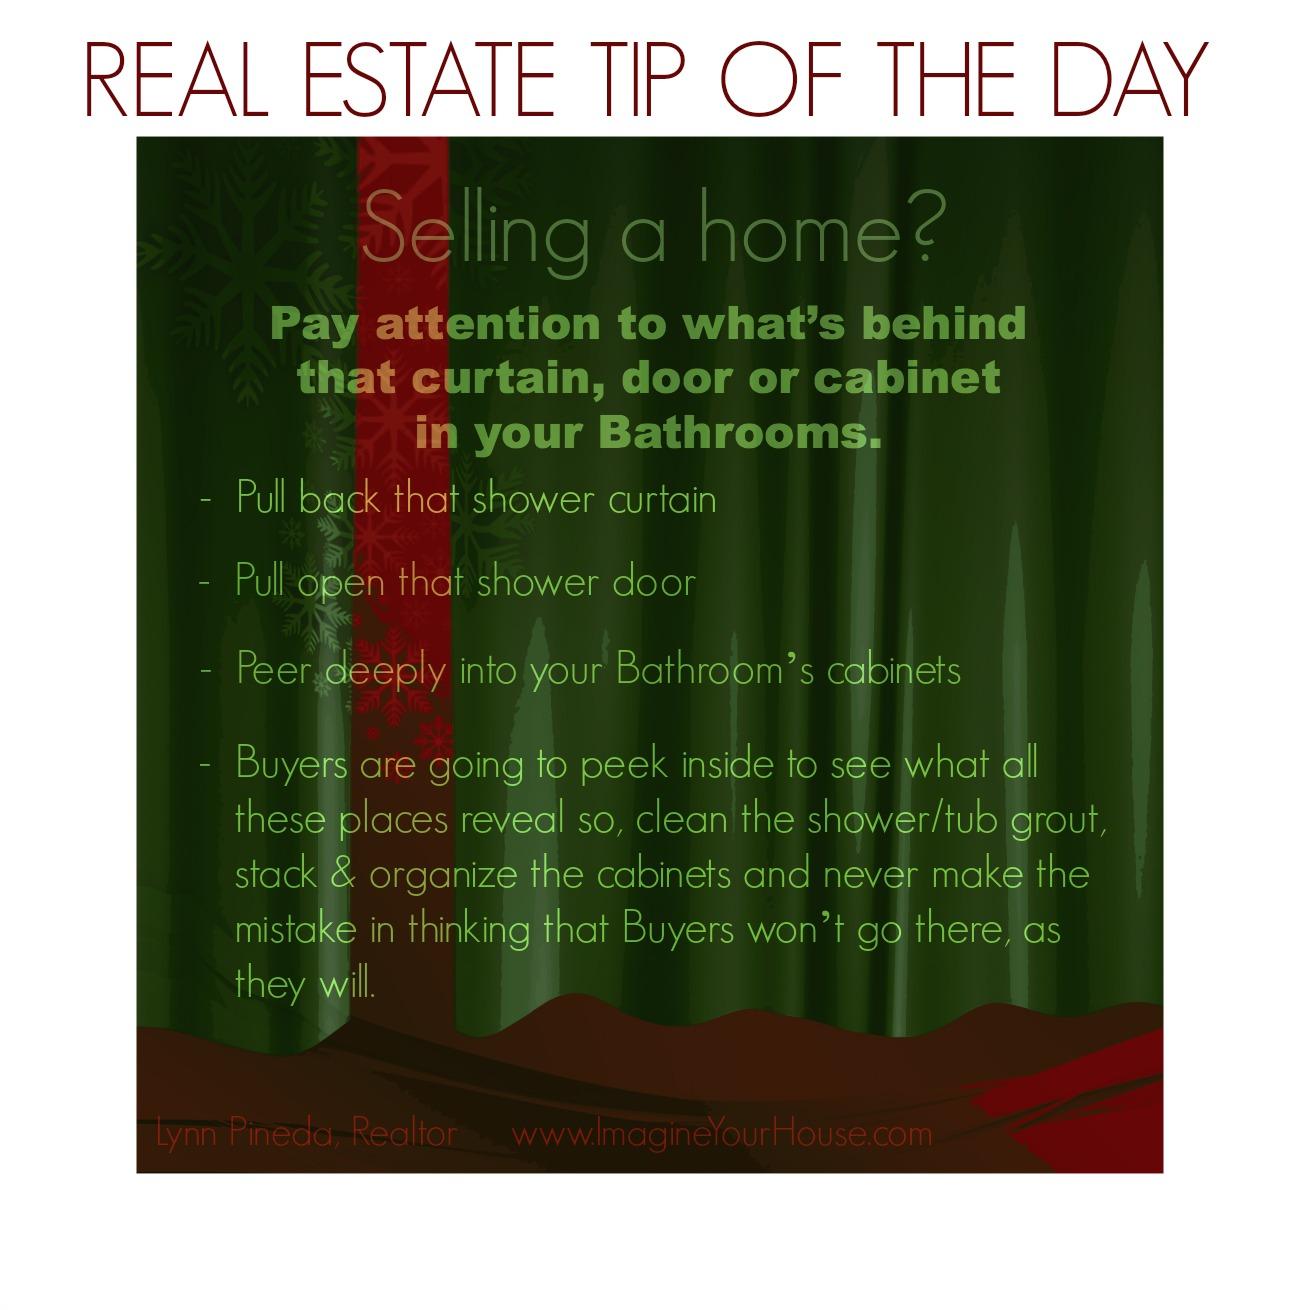 Real Estate Tip of the Day November 14, 2013 IYH